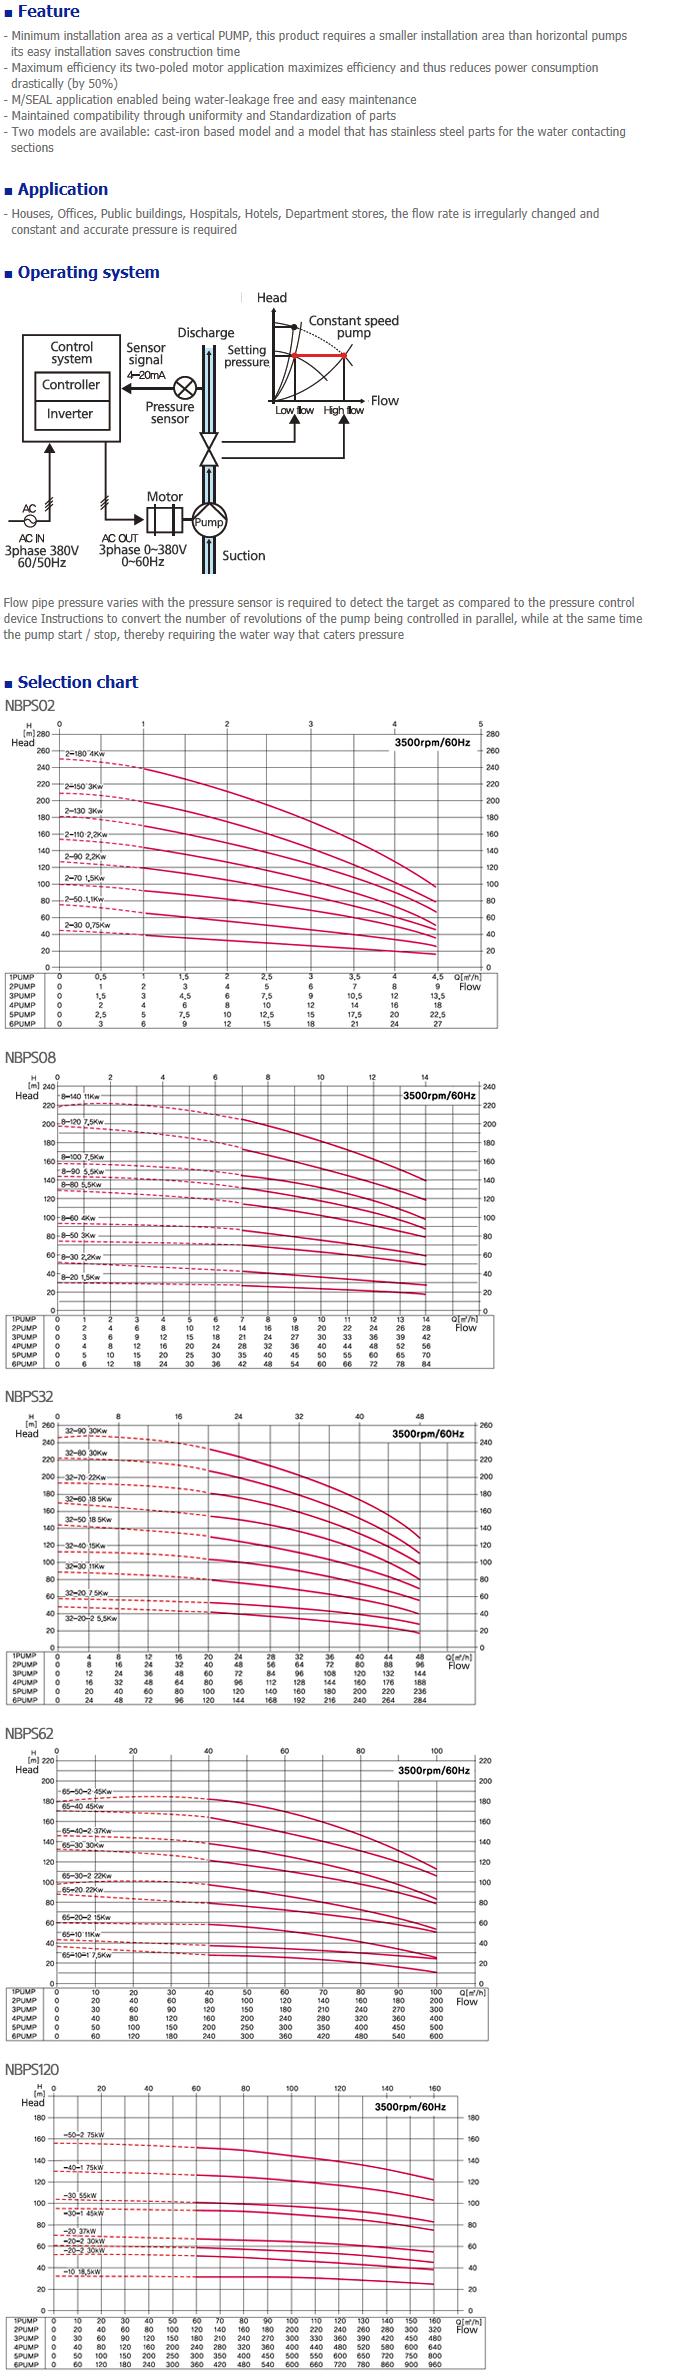 NEGATRON Booster pump NBPS Series